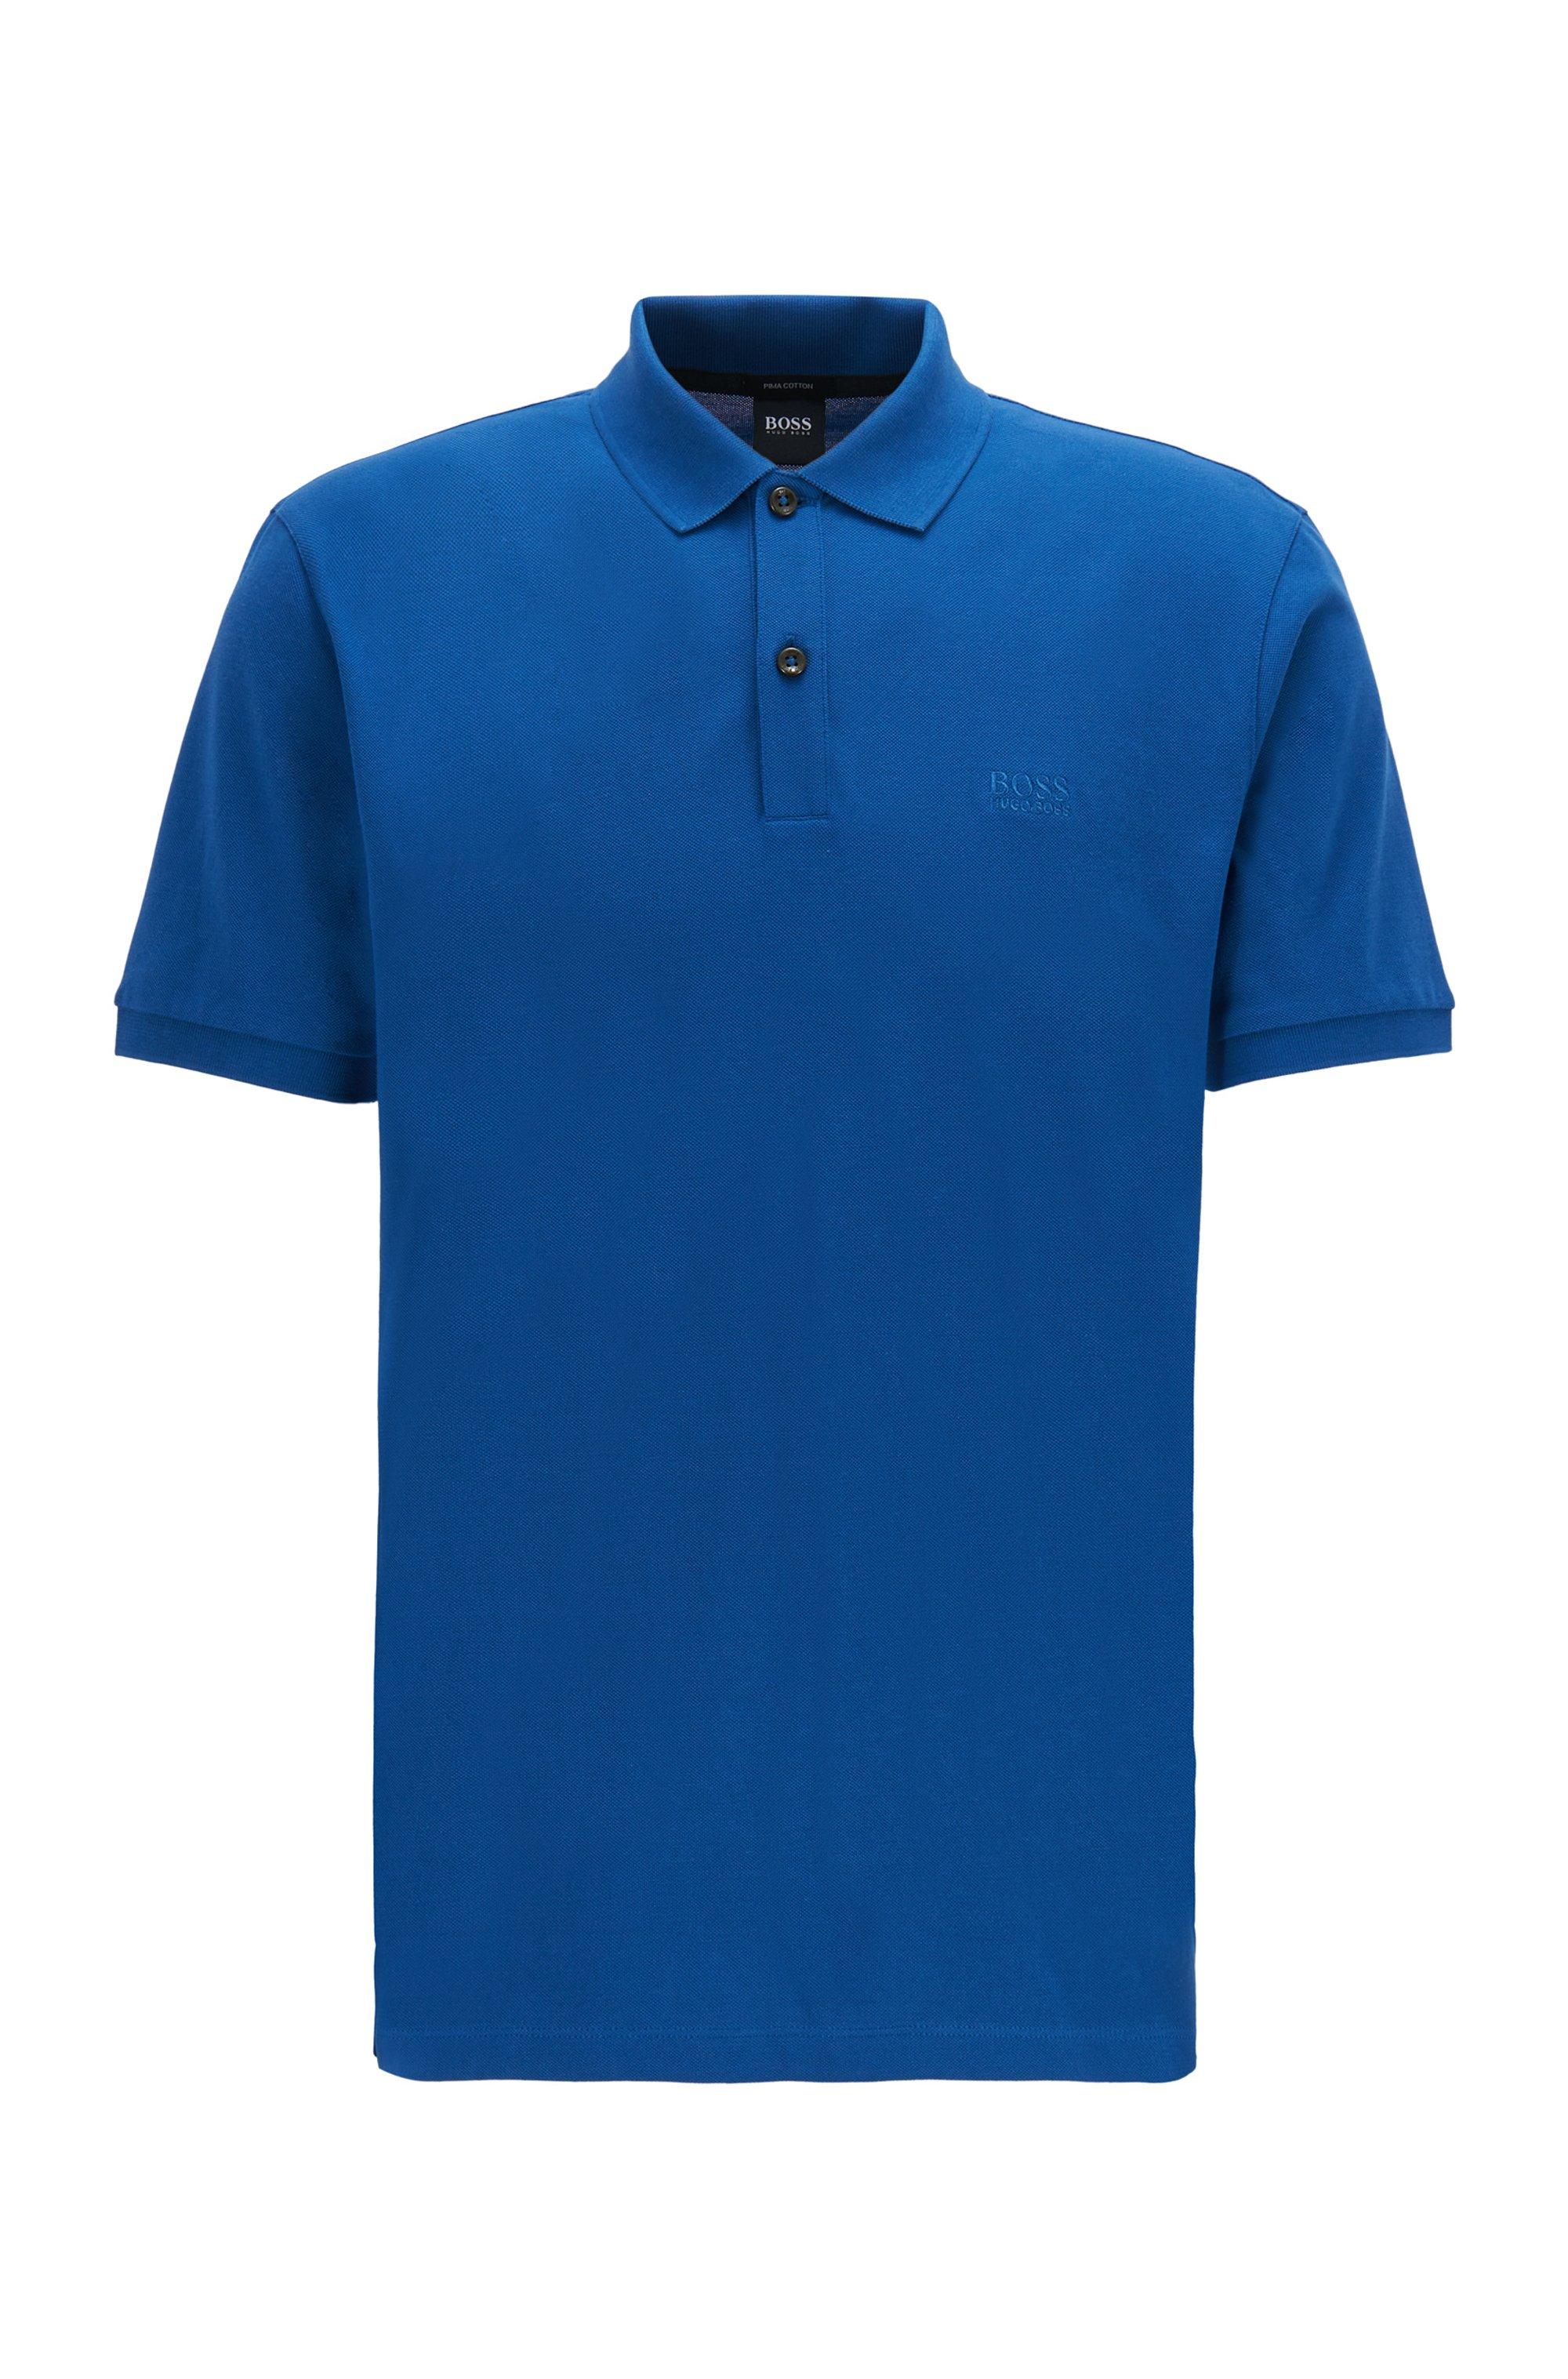 Poloshirt aus Pima-Baumwolle, Blau